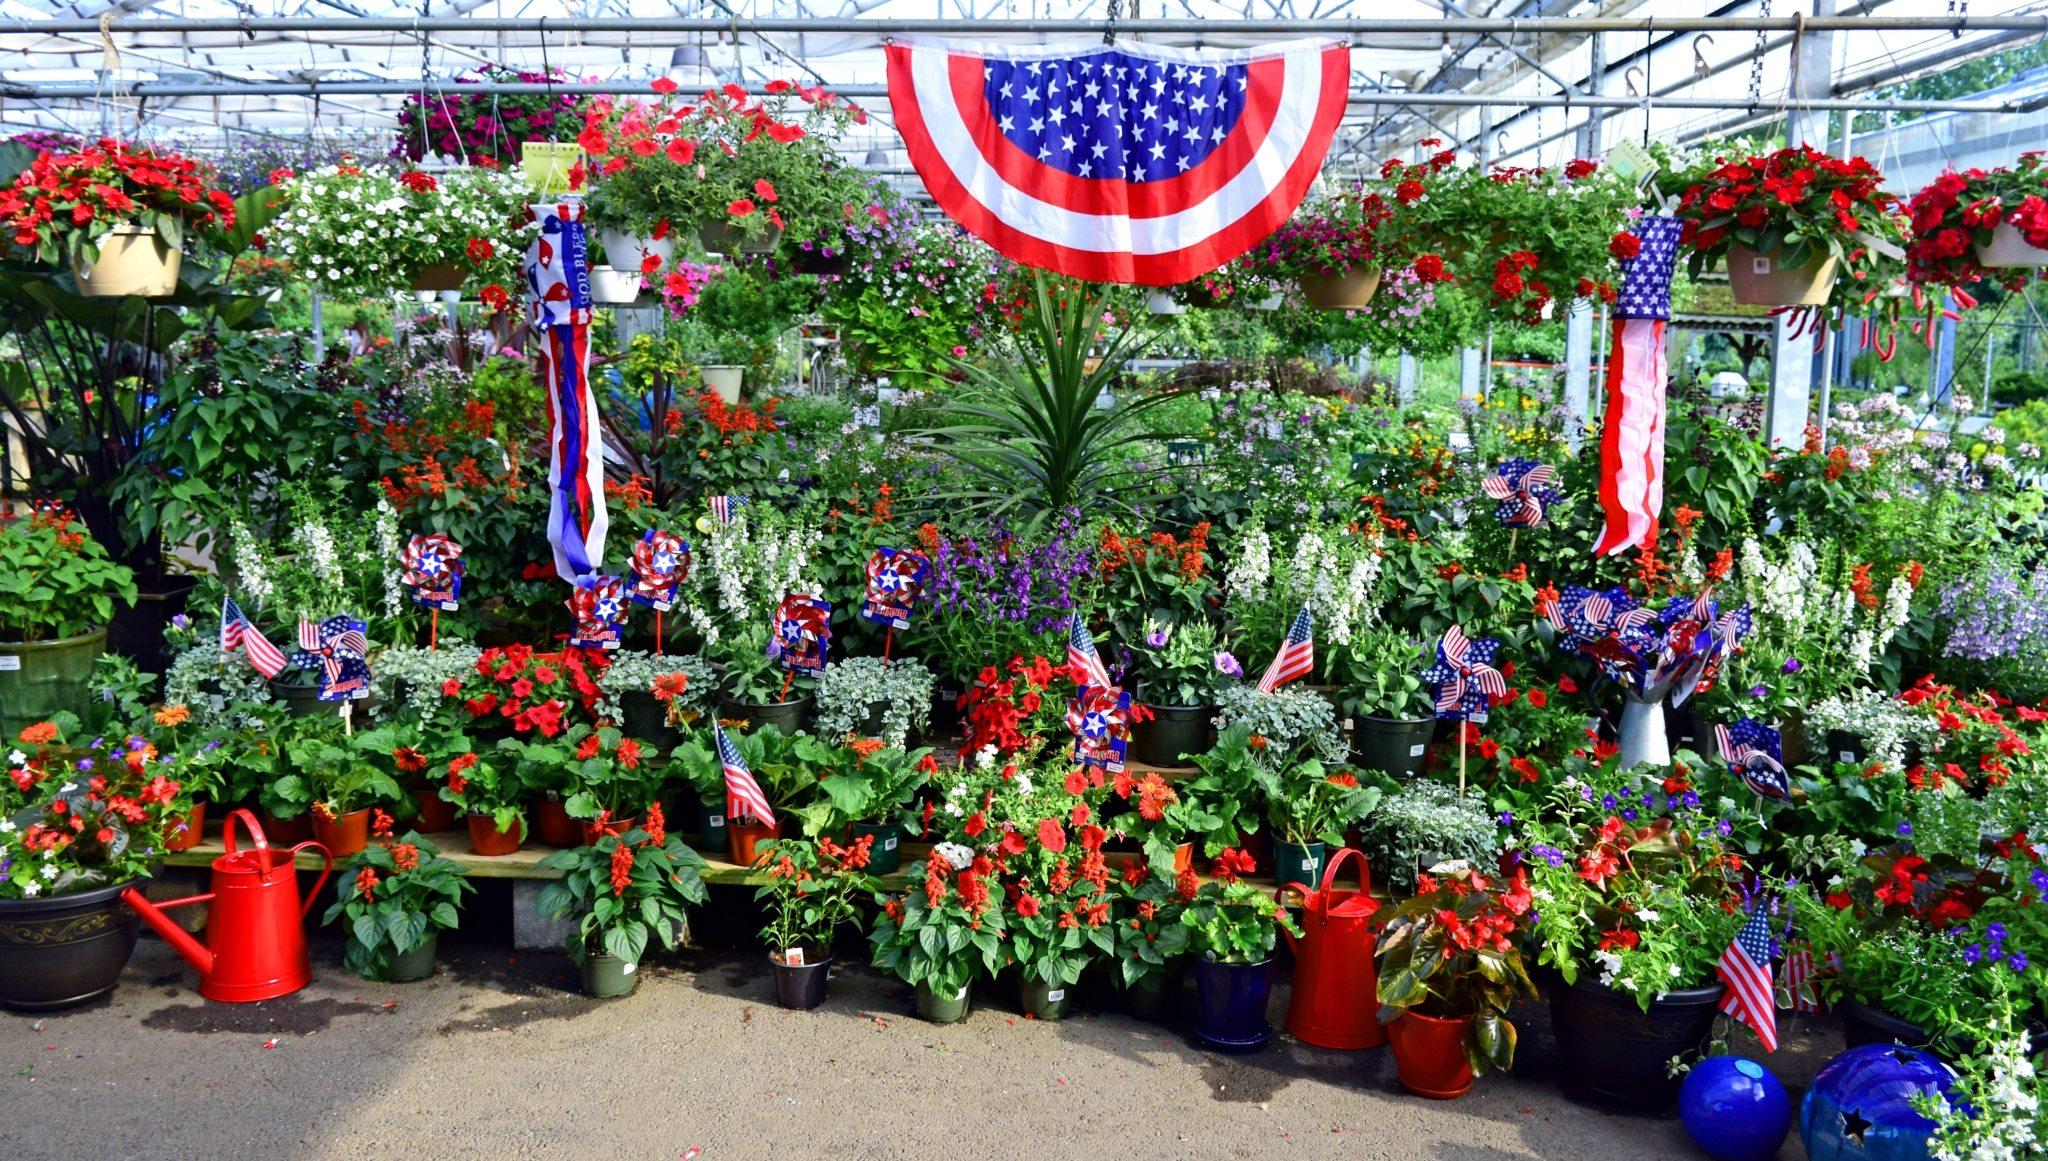 Terrific Merrifield Garden Center Merrifield Garden Center Home Design Merrifield Garden Center Centreville Va Merrifield Garden Center Bristow Va Red houzz-03 Merrifield Garden Center